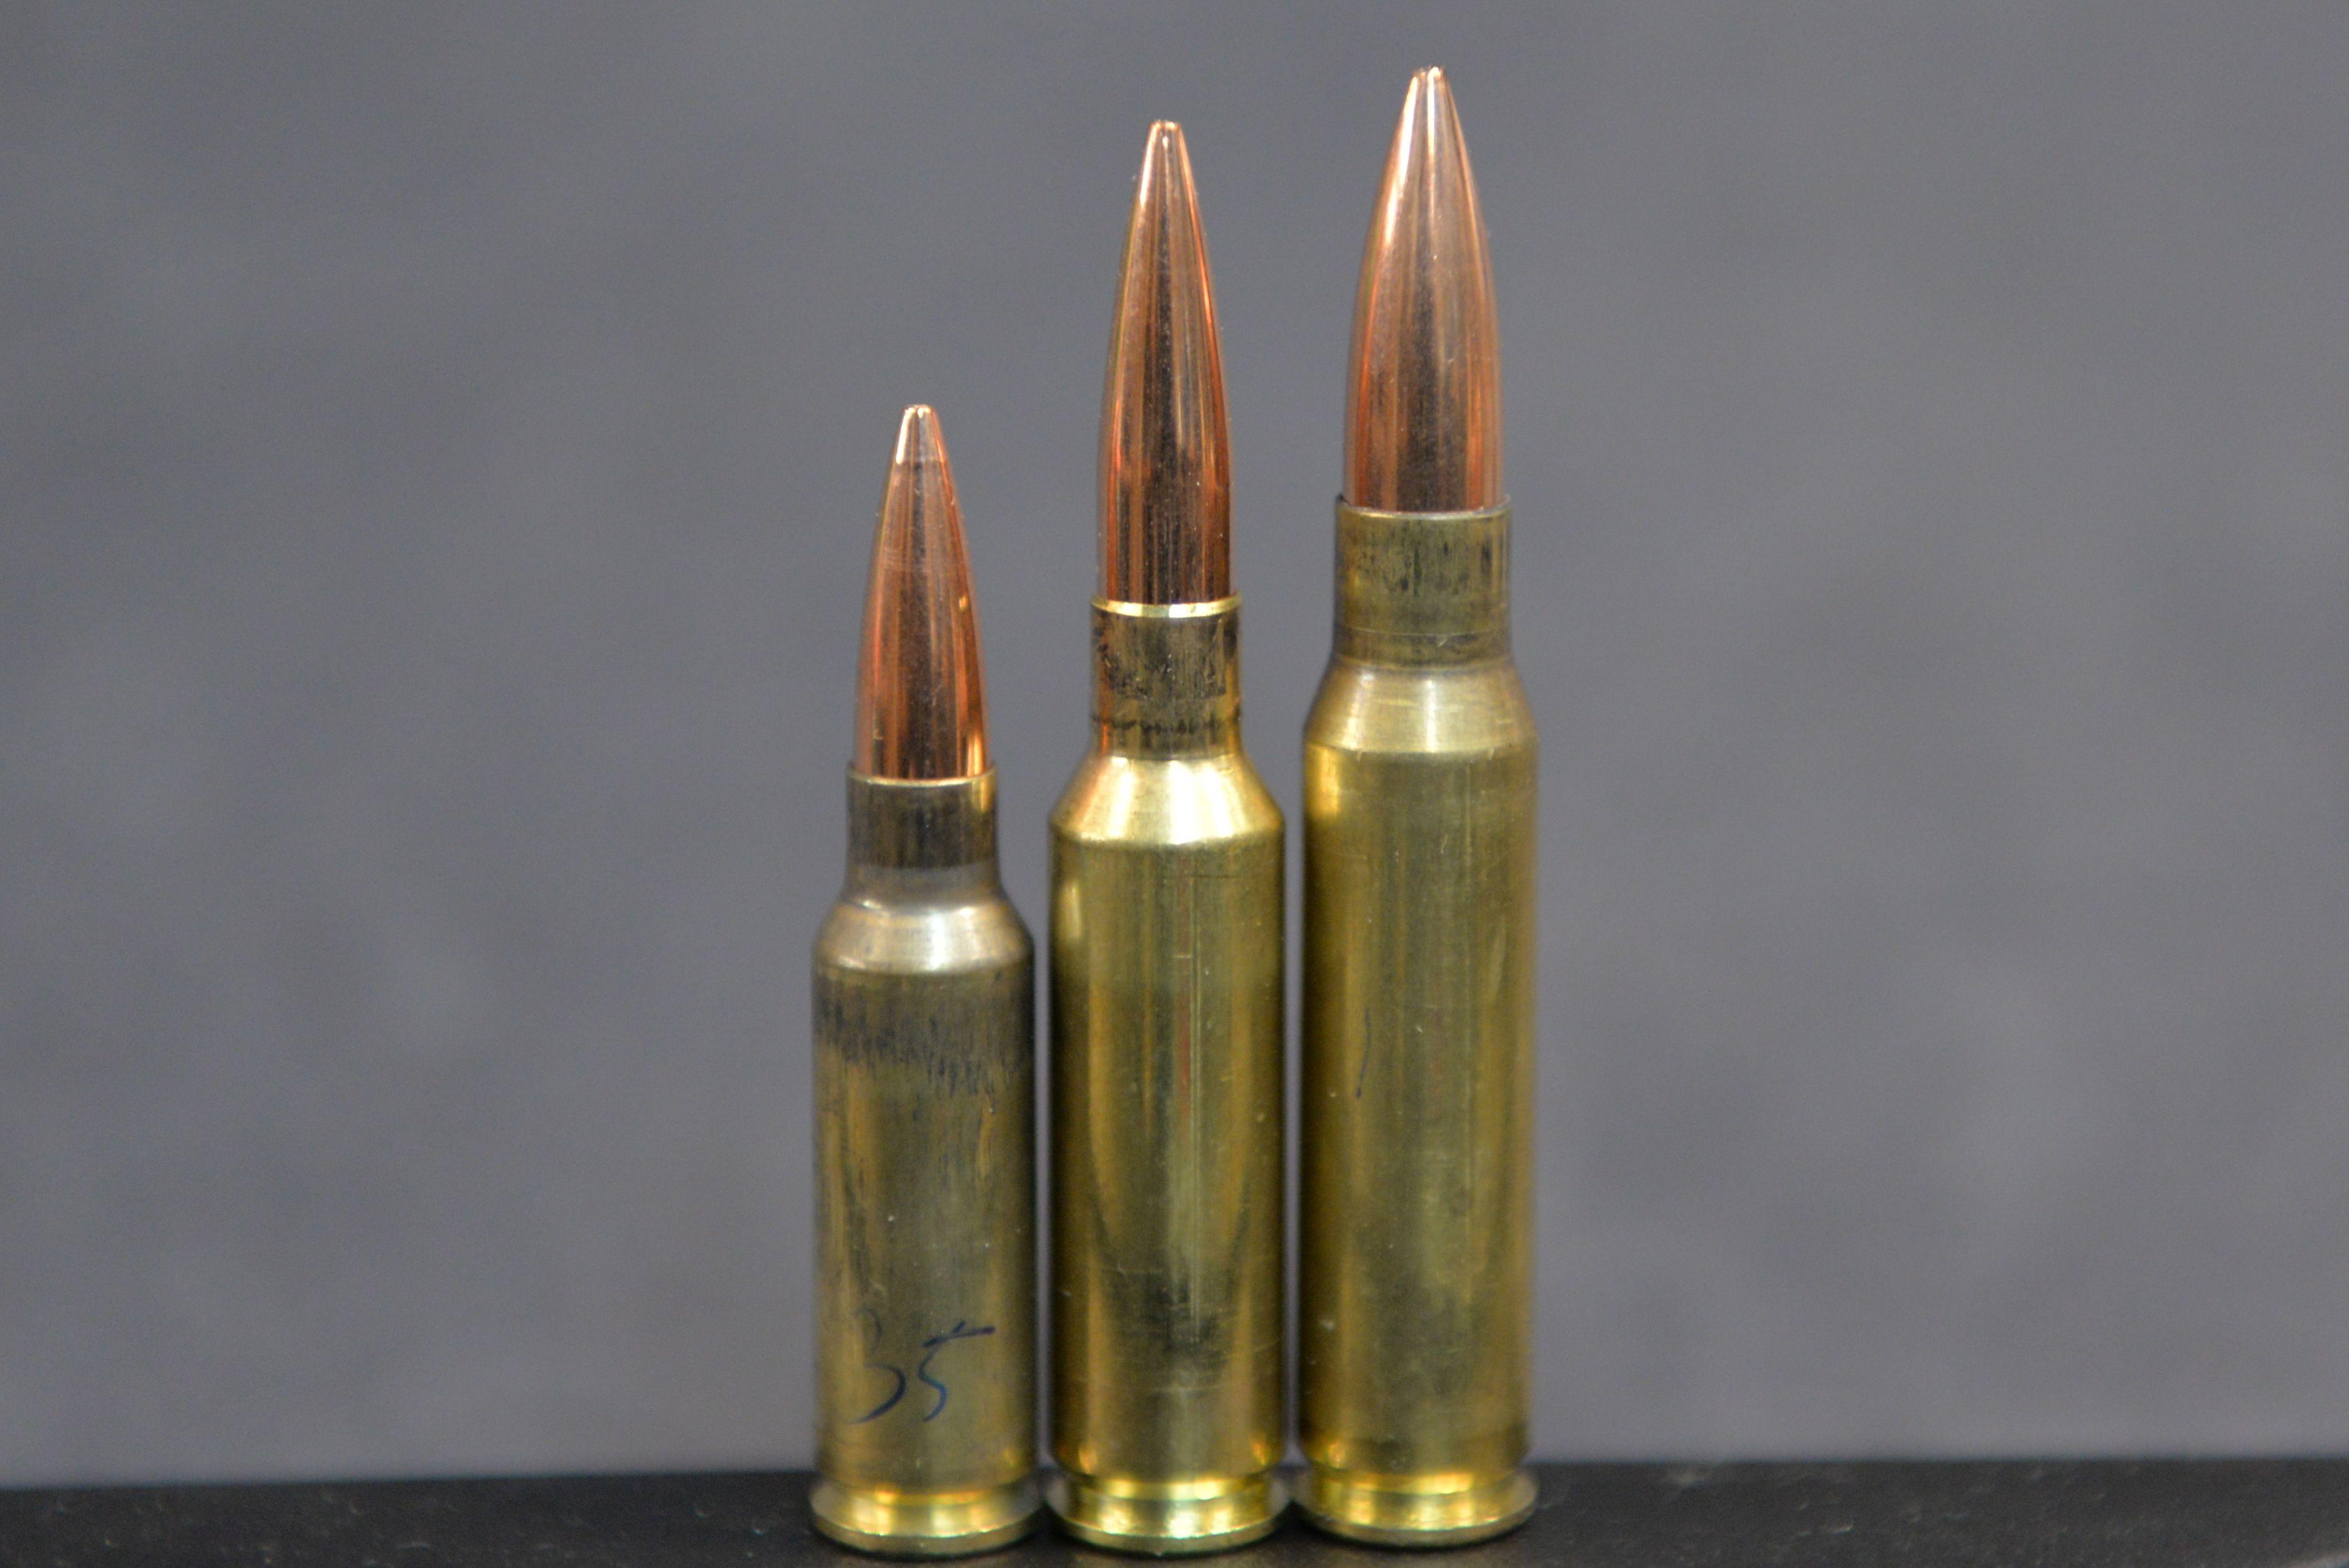 [Image: 6.5-Grendel-6.5x47-Lapua-308-Winchester.jpg]